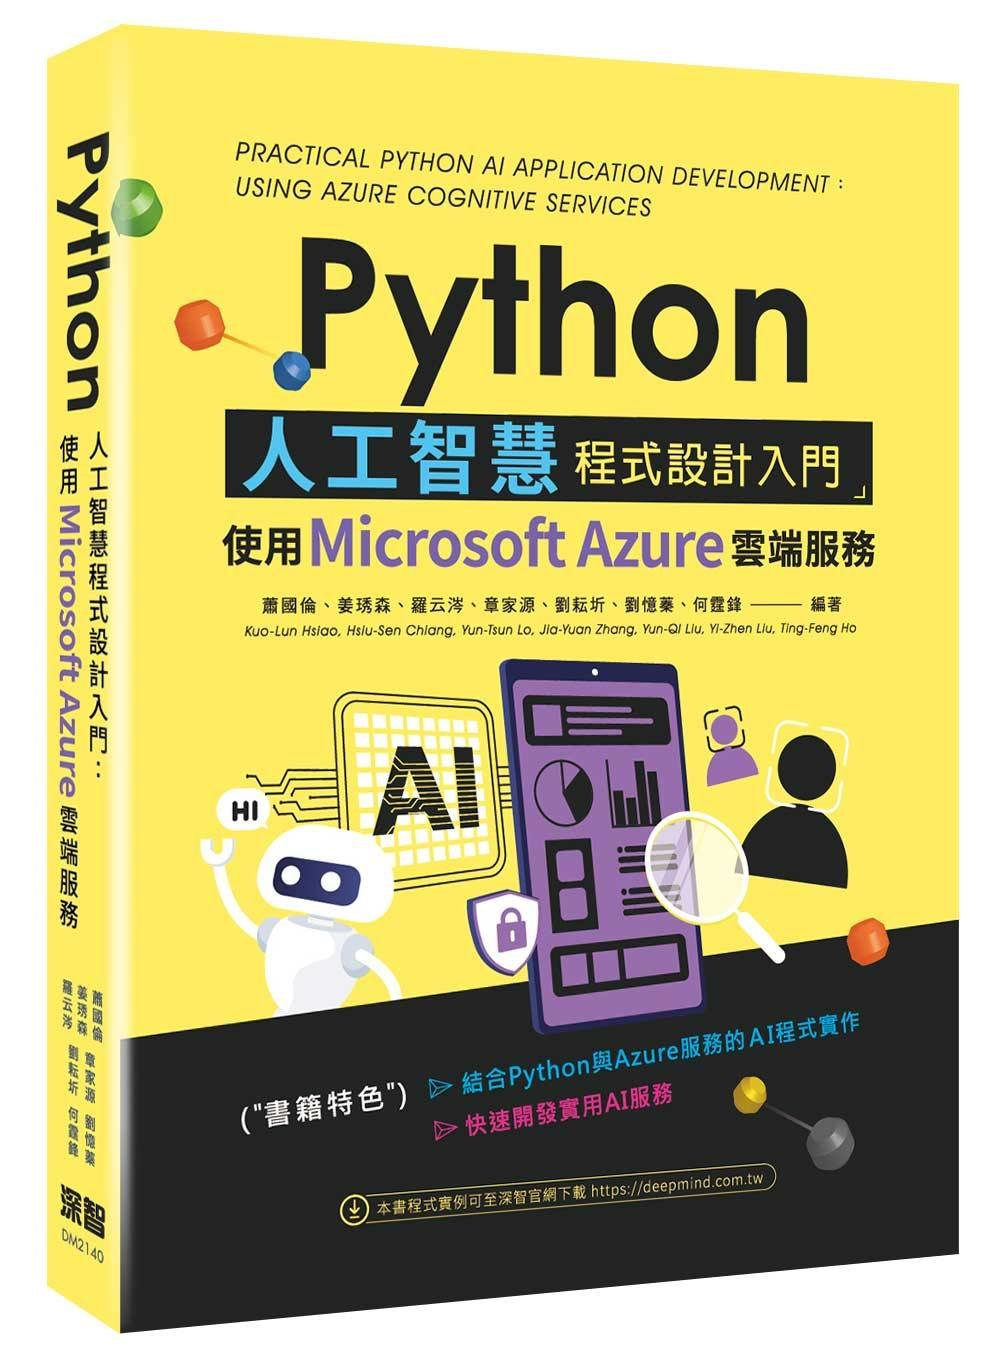 Python 人工智慧程式設計入門:使用 Microsoft Azure 雲端服務-preview-1